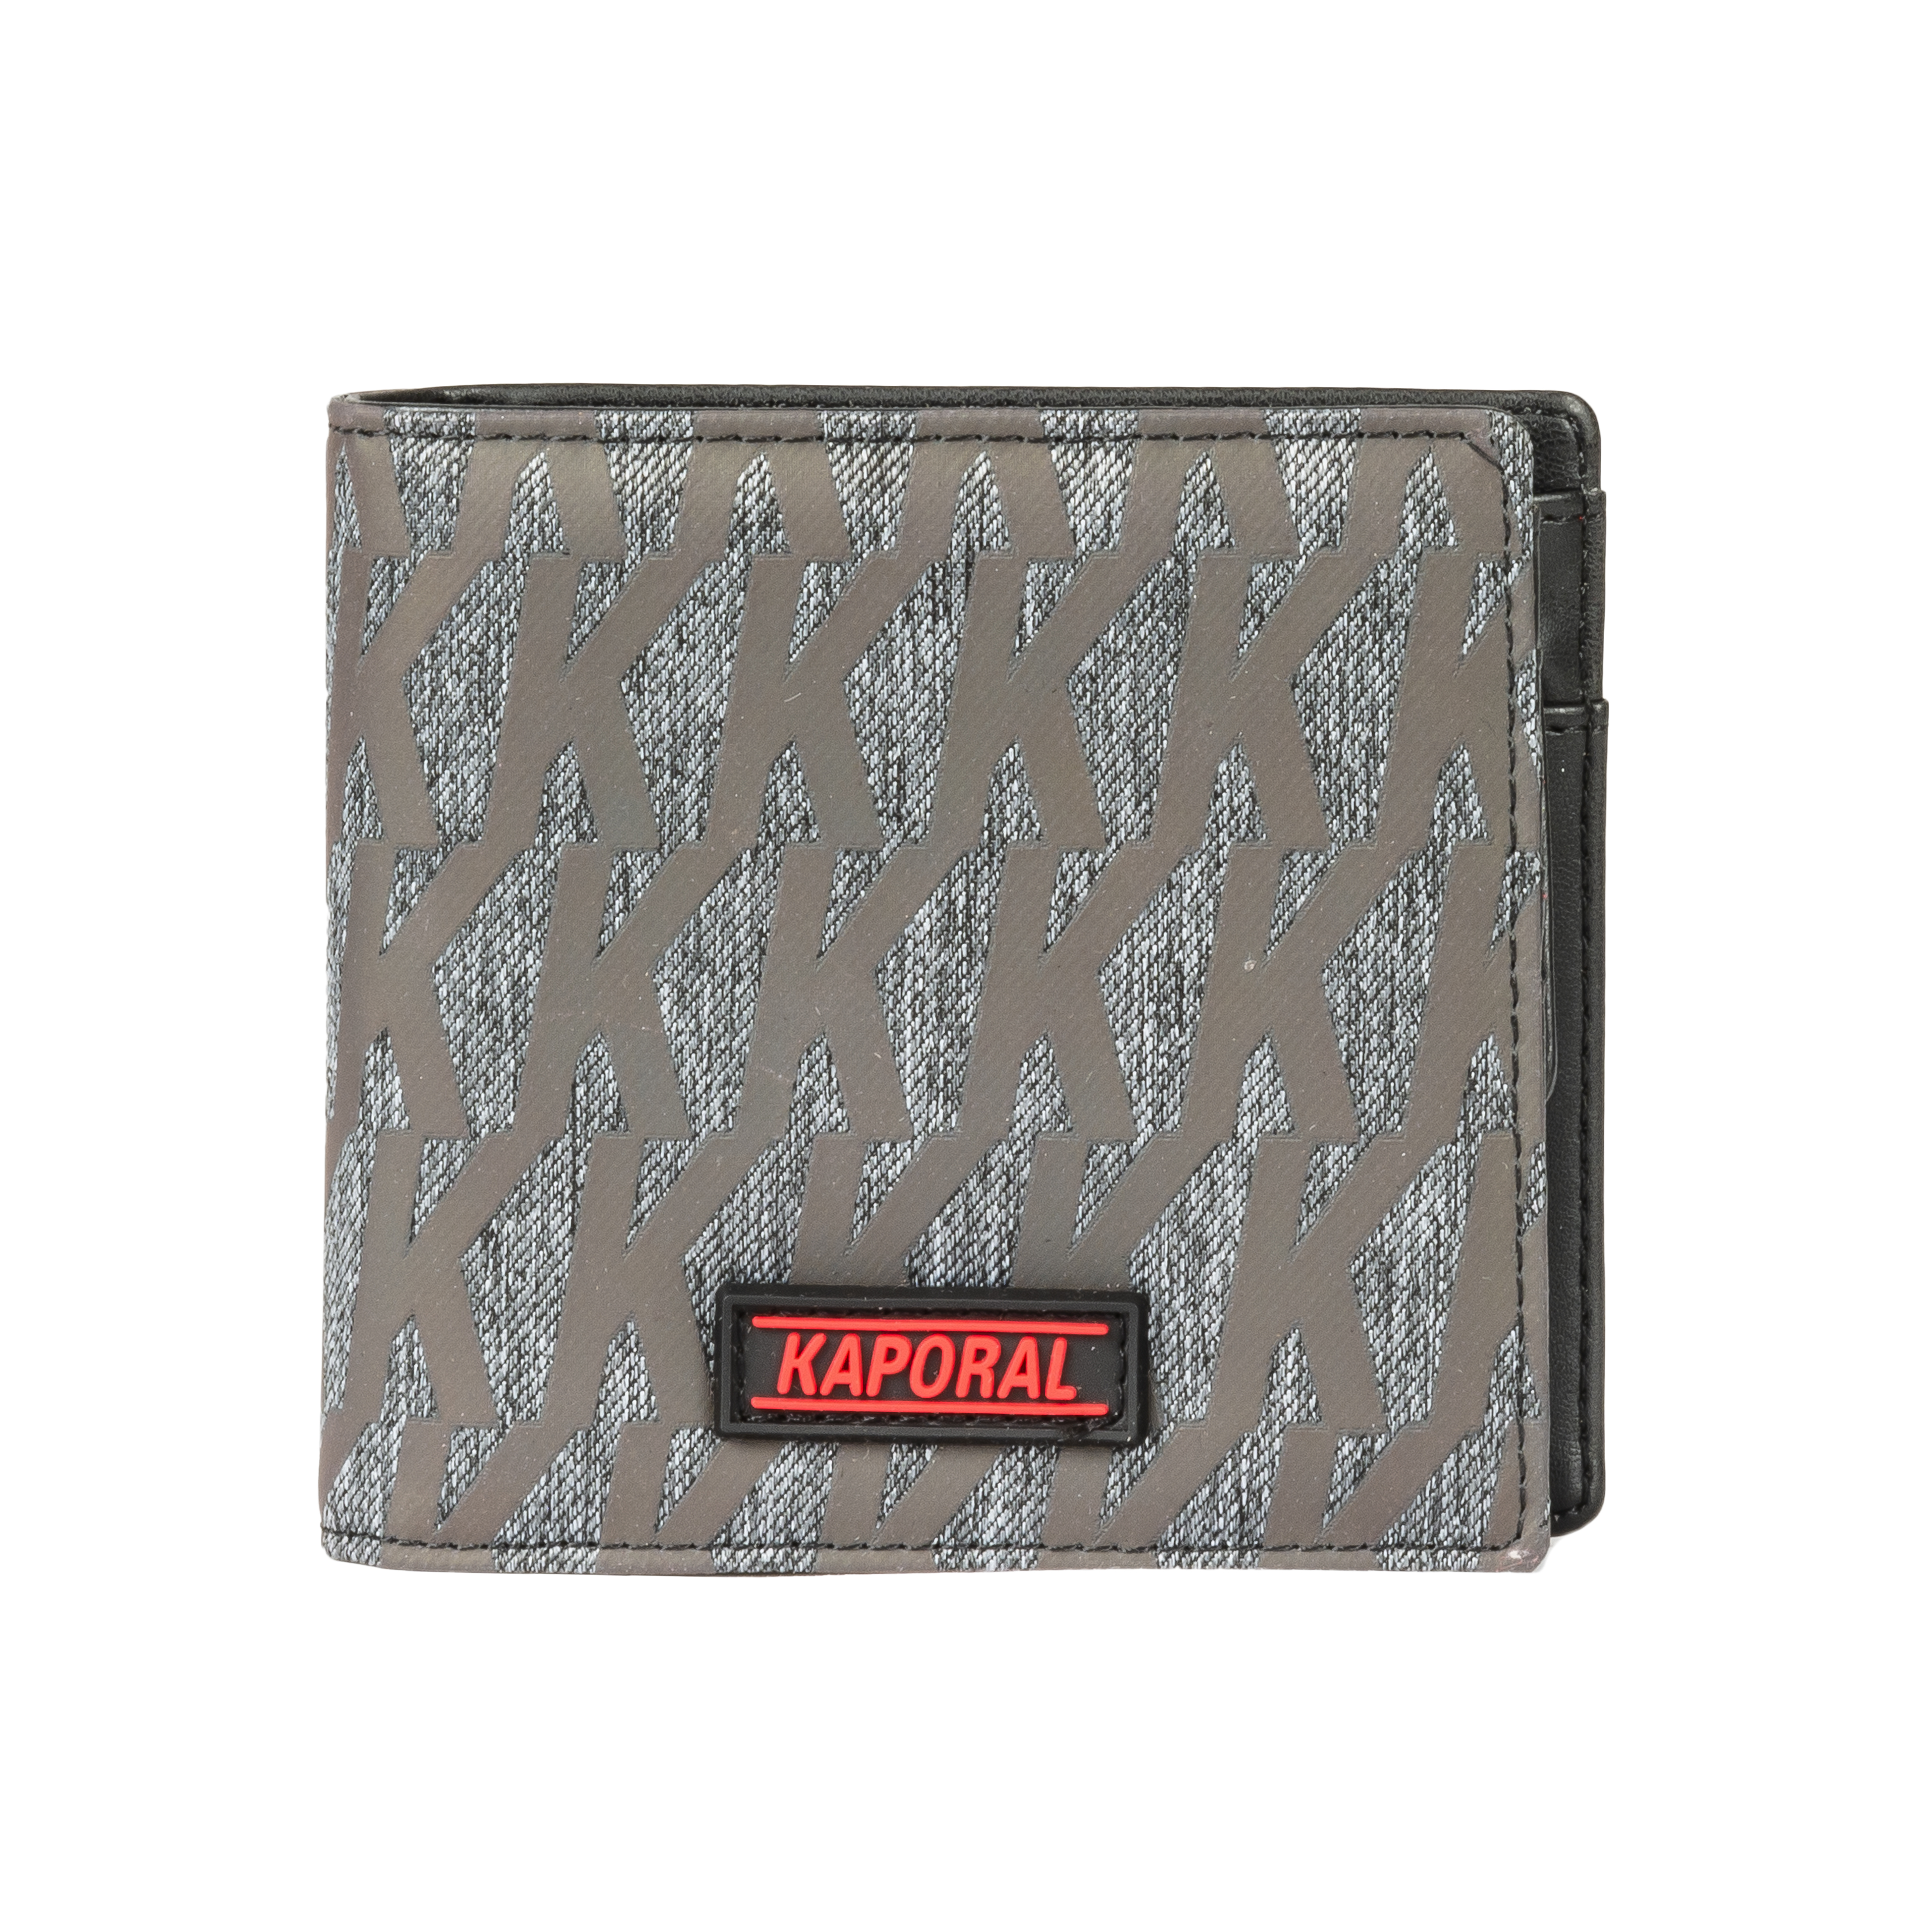 Portefeuille italien  gris anthracite logotypé